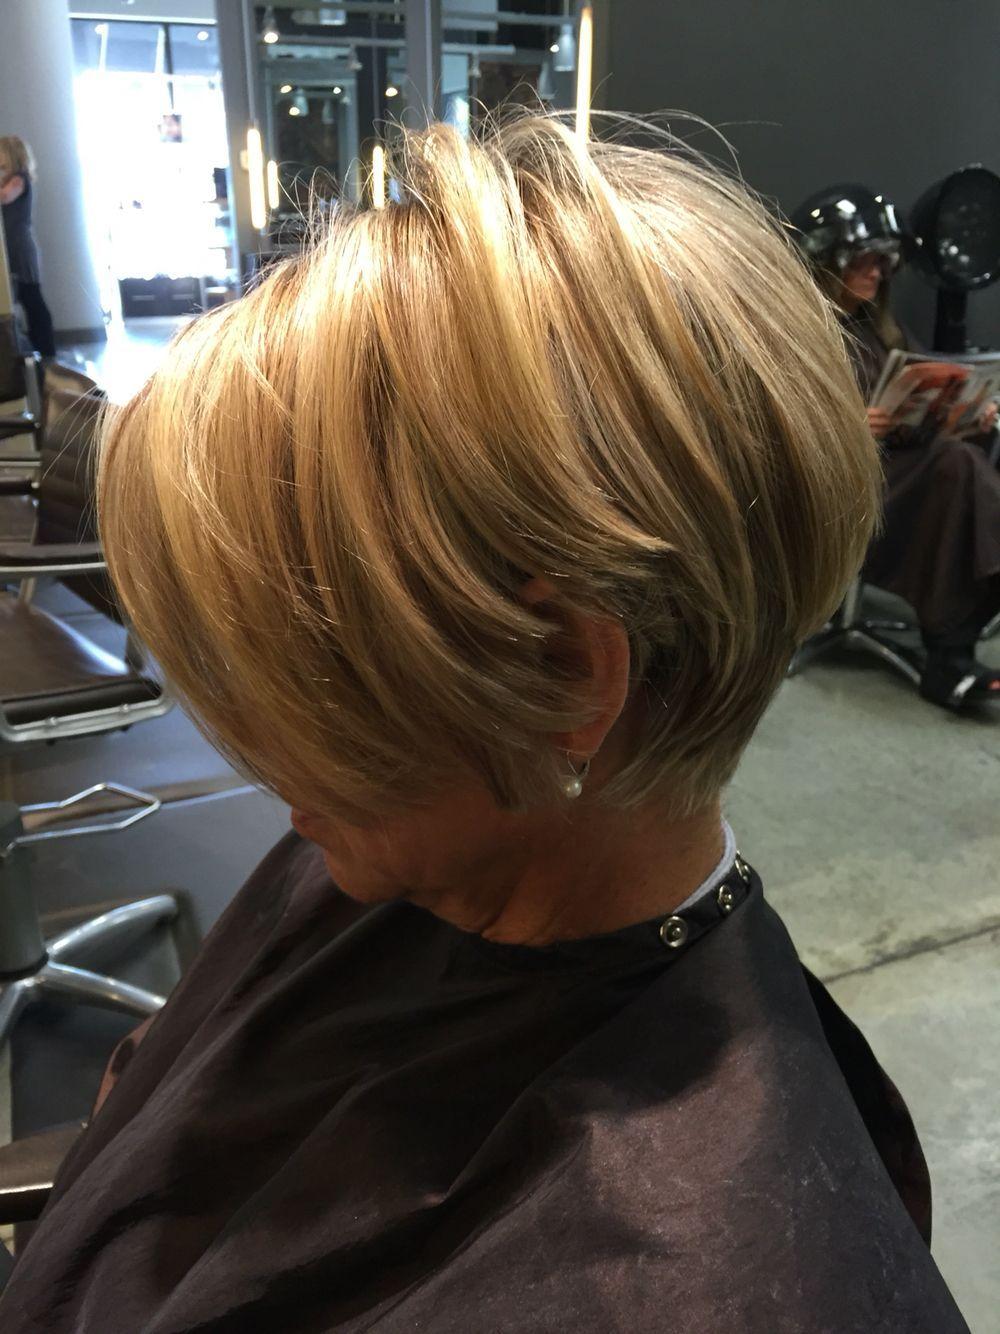 Bffbdcfedcfeag pixels hair